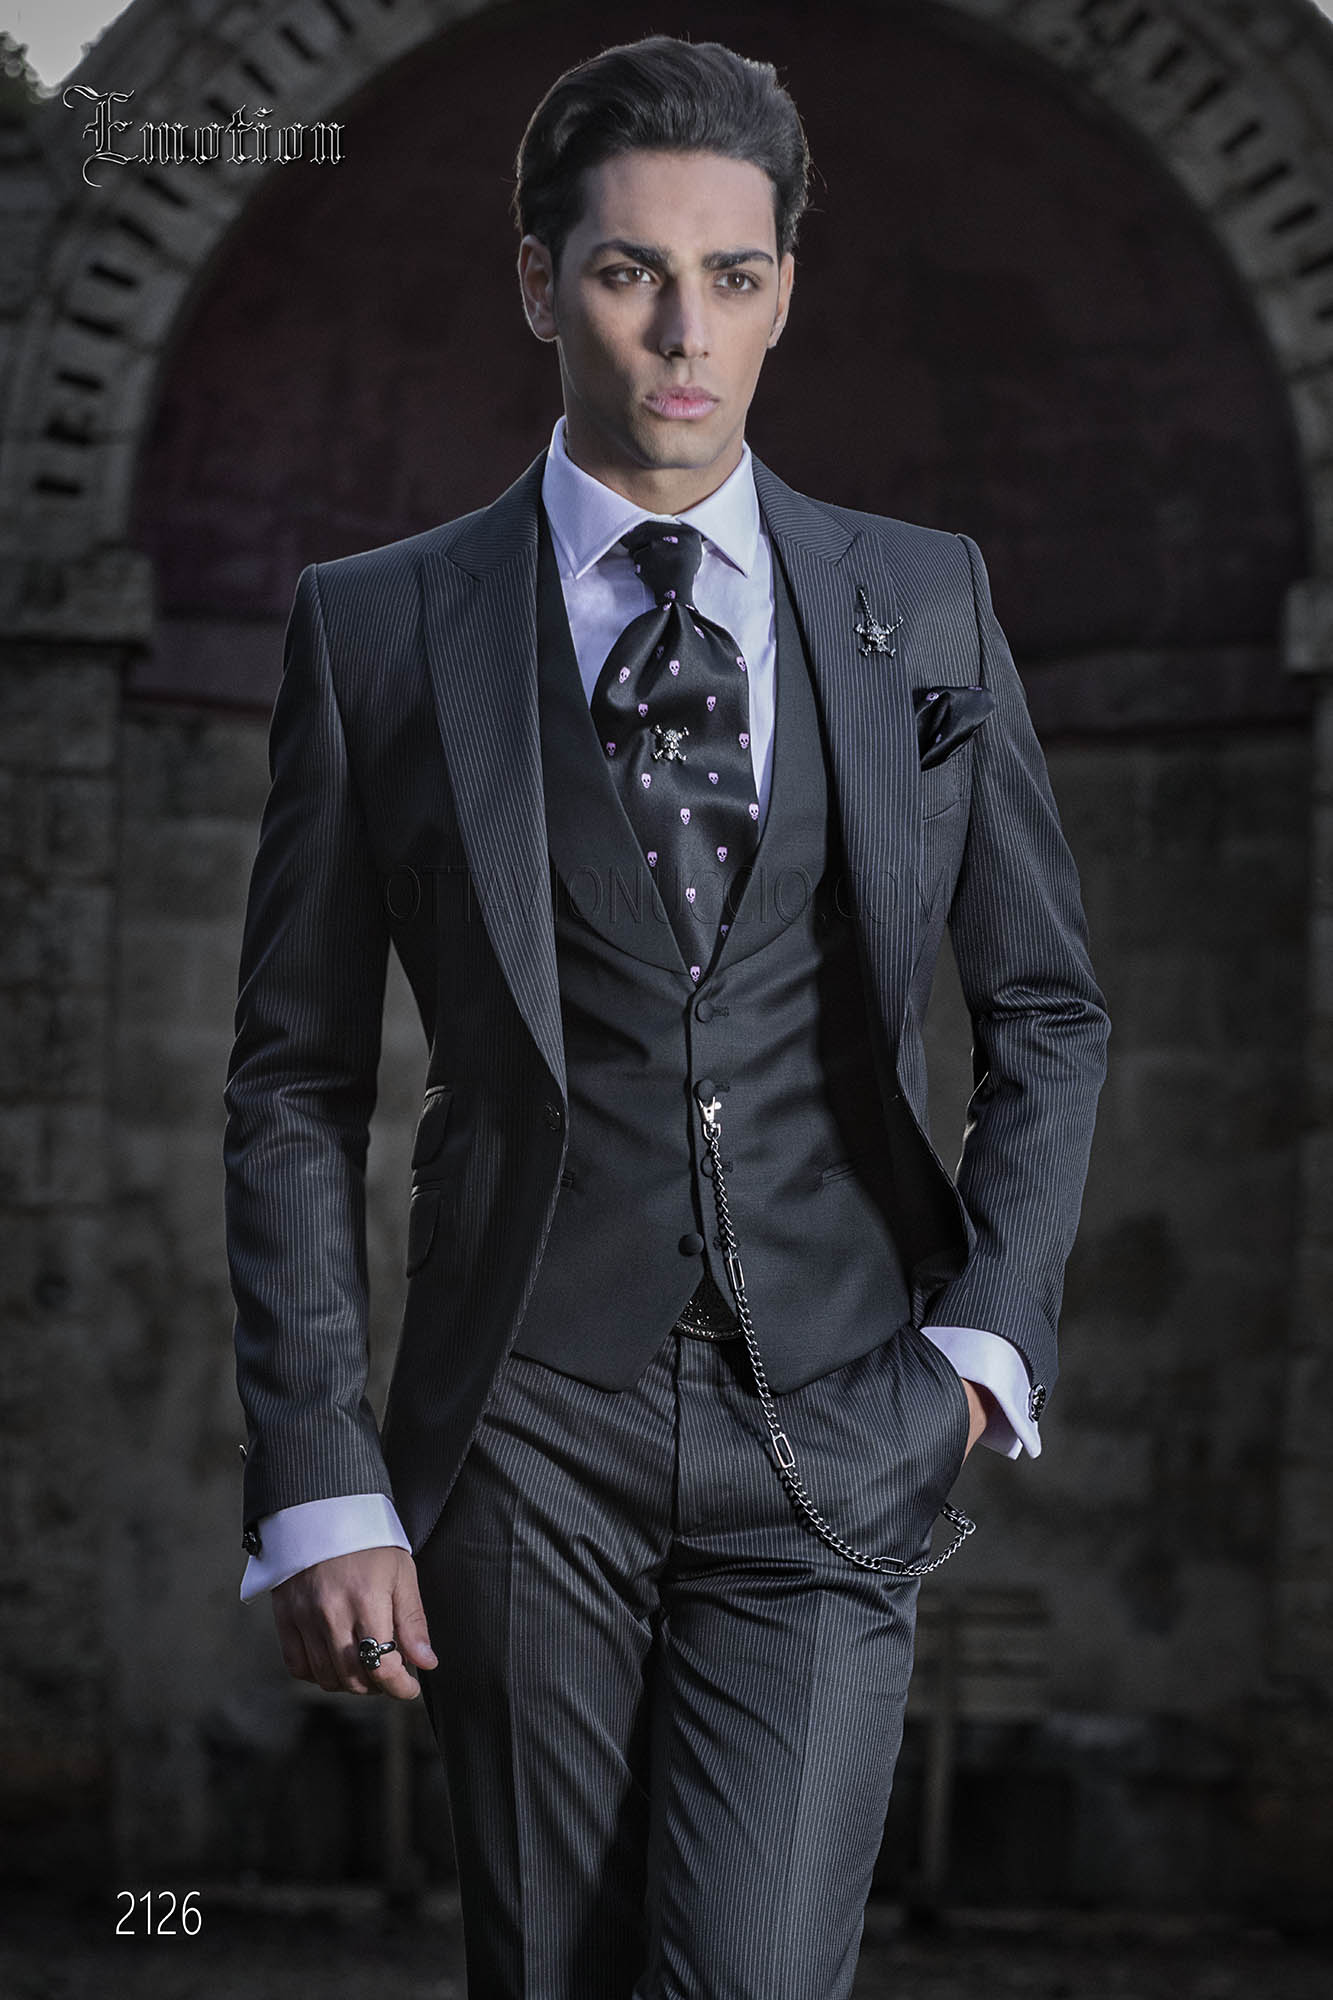 Outstanding Men Groom Suit Image Collection - Wedding Dress Ideas ...